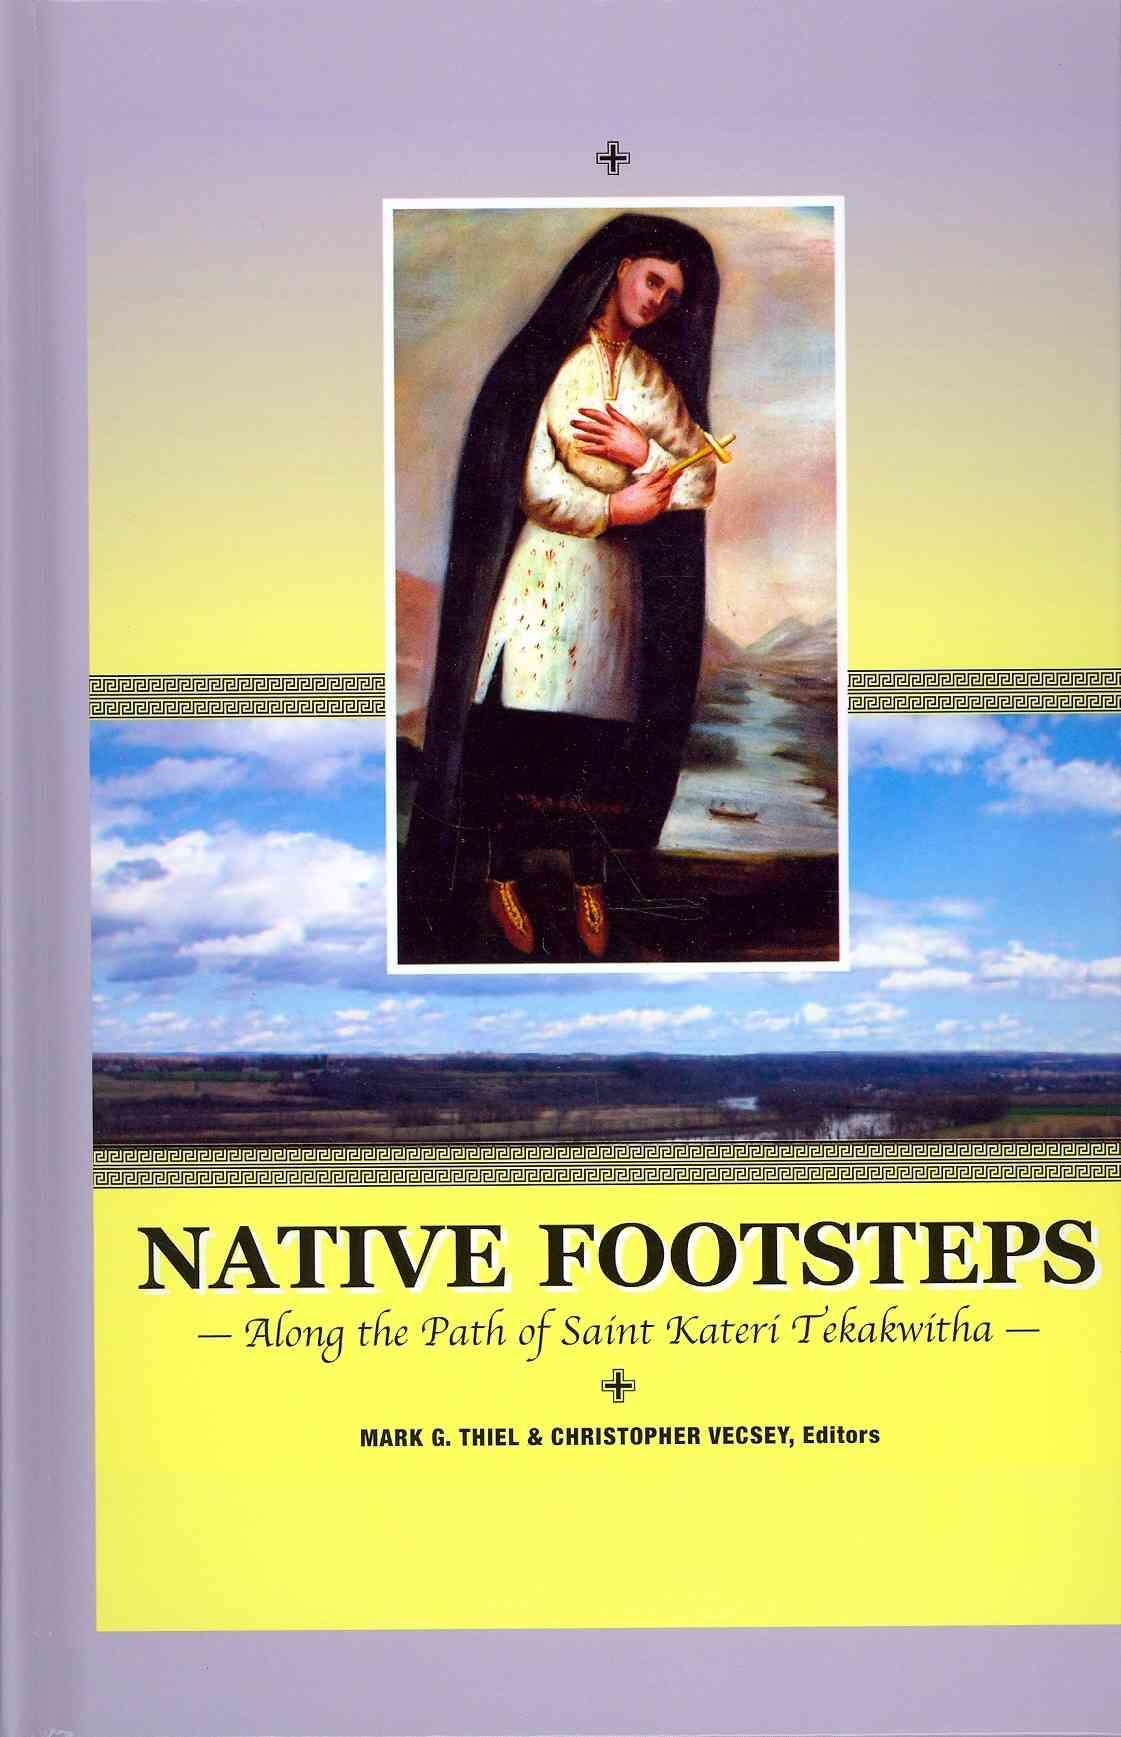 Native Footsteps: Along the Path of Saint Kateri Tekakwitha (Paperback)